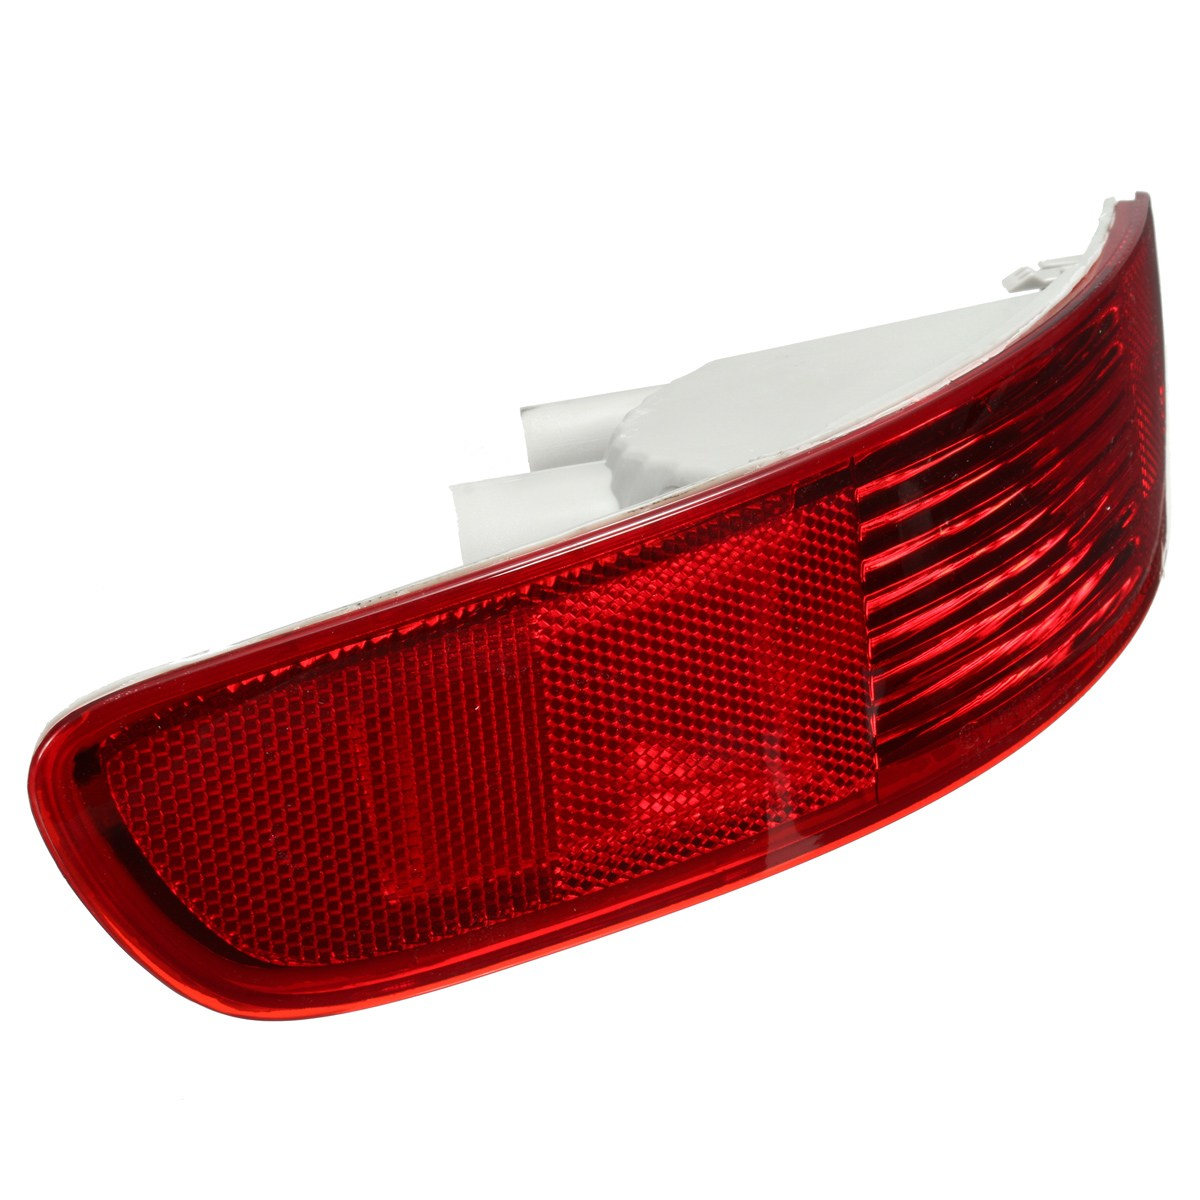 1Pcs Car Rear Tail Fog Light Warning Lamp Right/Left For Mitsubish Outlander for Peugeot for Citroen 07-12